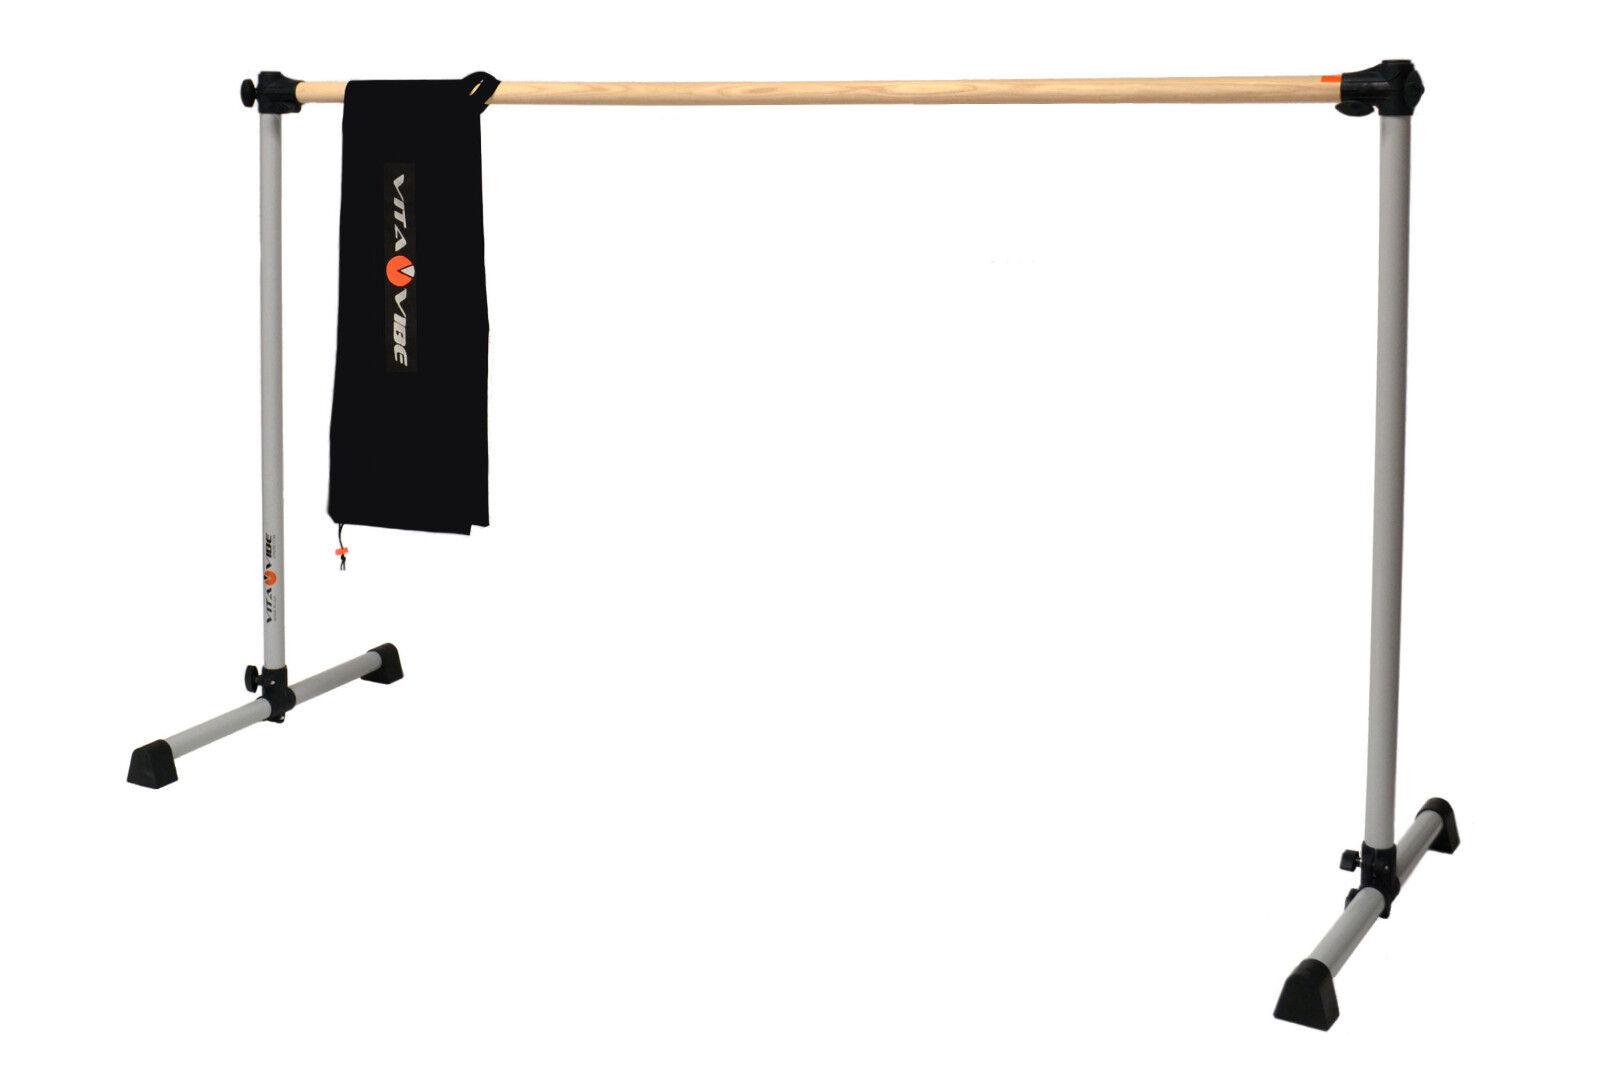 Ballet Barre BNB5-W Freestanding 5ft Single Wood Bar w/Bag-Stretch/Dance Bar-NEW